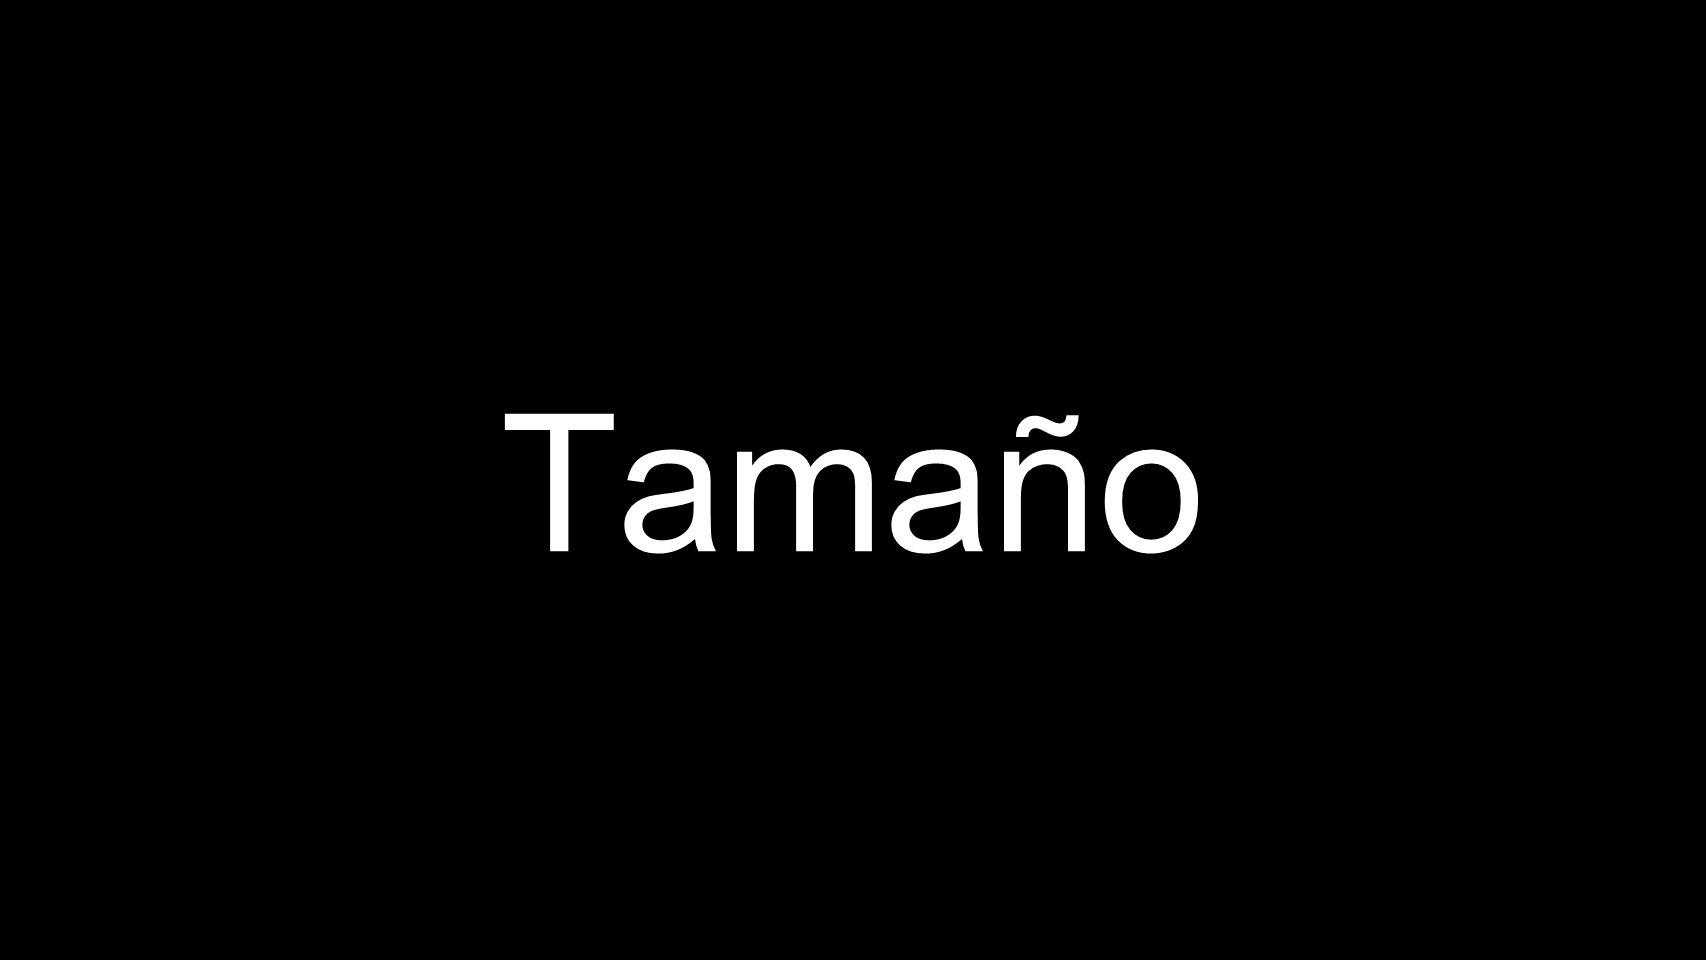 Tamaño